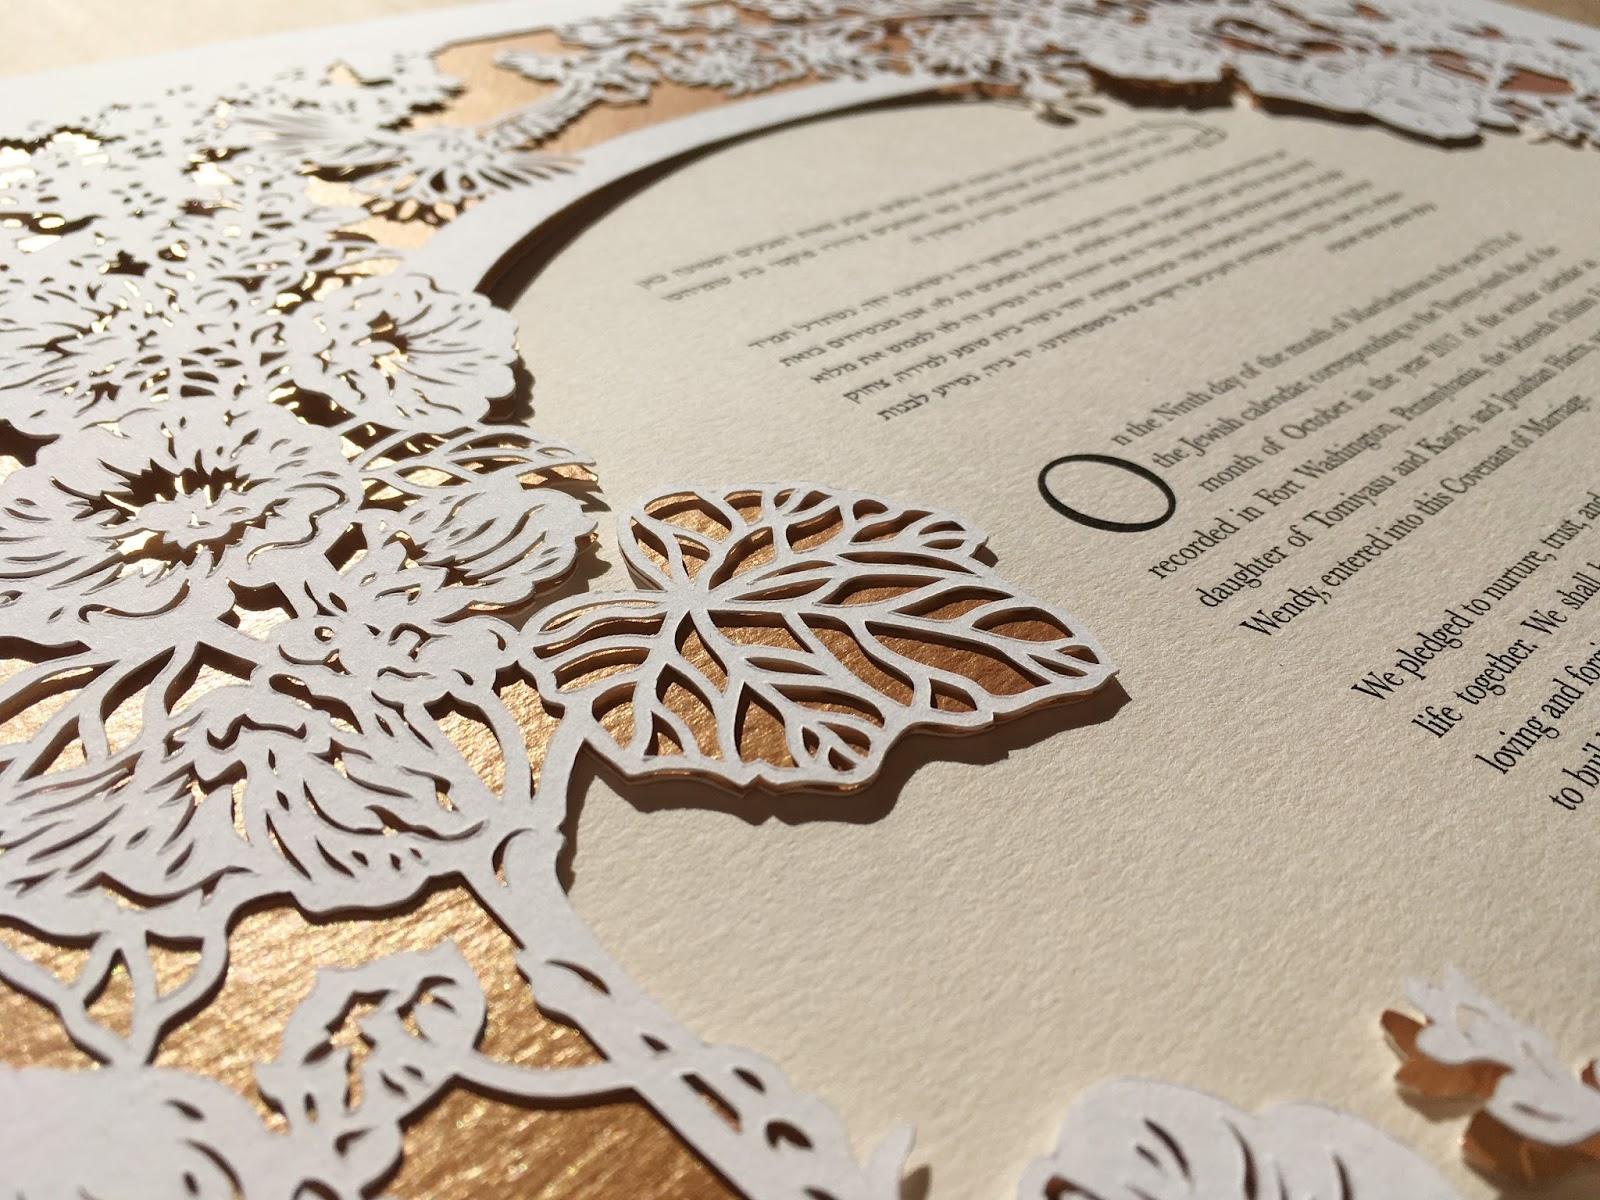 custom designed and cut by artist Naomi Shiek